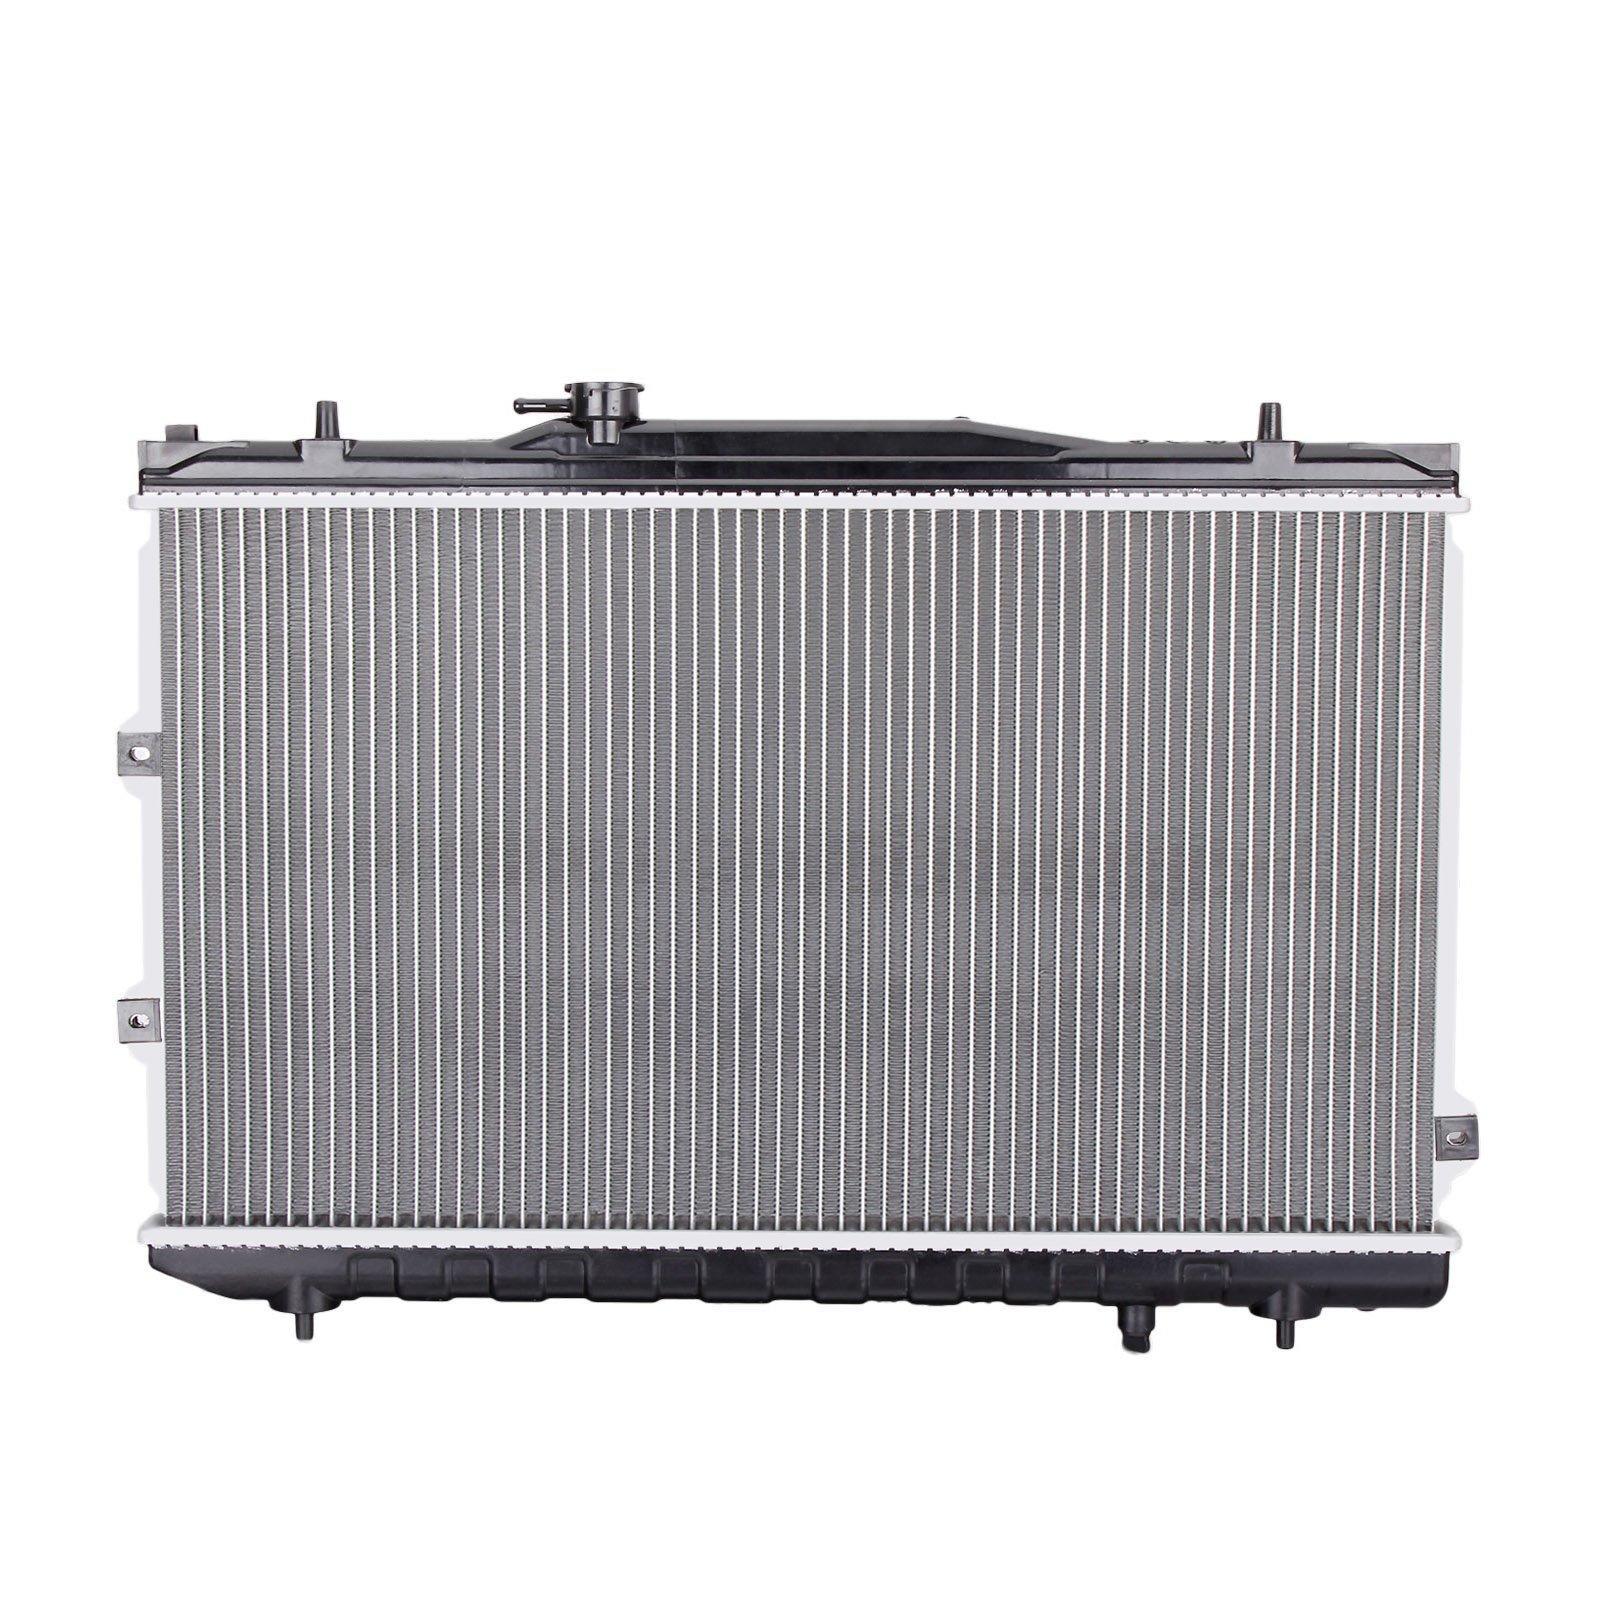 Aluminum Radiator For KIA Cerato LD 2.0L G4GC 4Cyl Engine 2004-2009 Auto/Manual